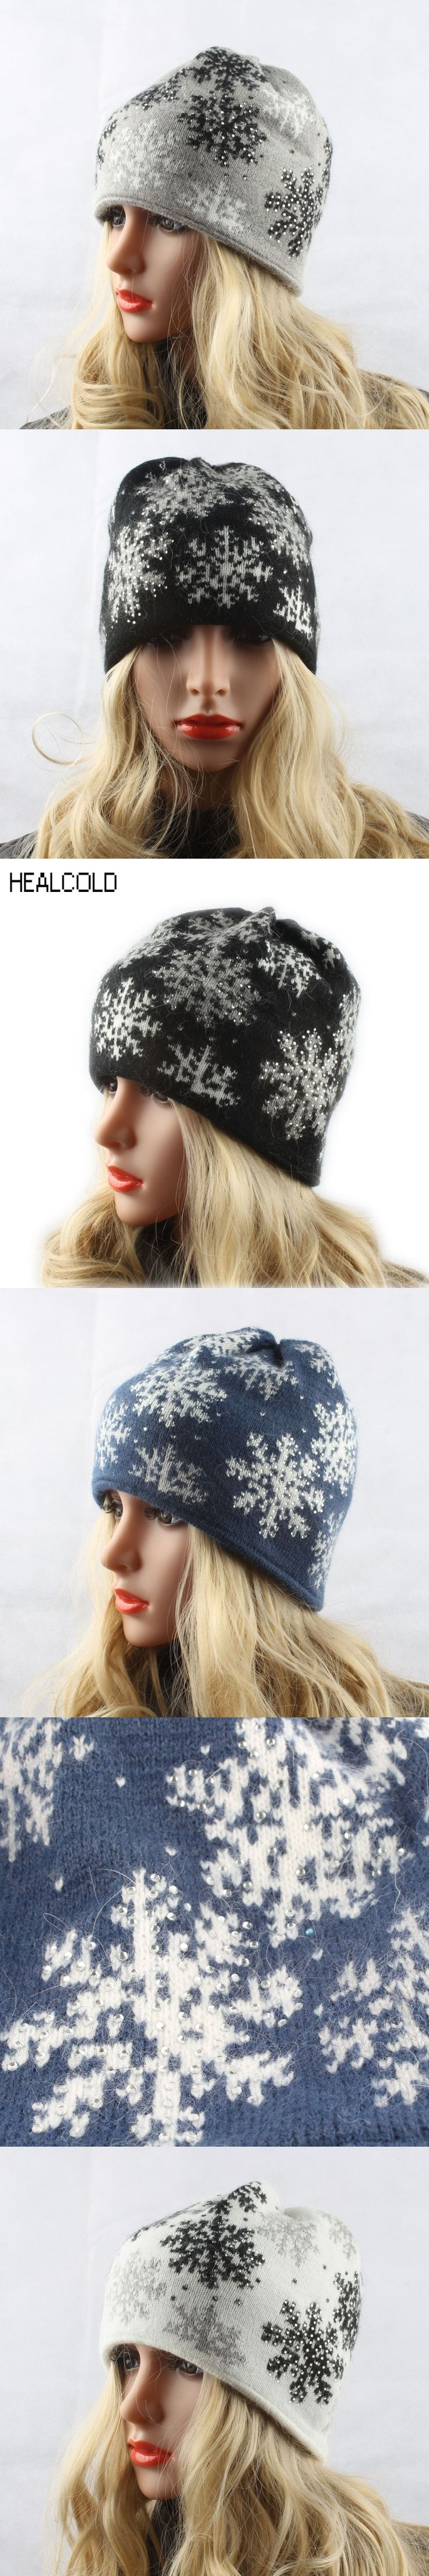 HEALCOLD Winter Thick Knitted Rabbit Fur Hats For Women Jacquard Snowflake Ski cap Skullies Diamond Beanies